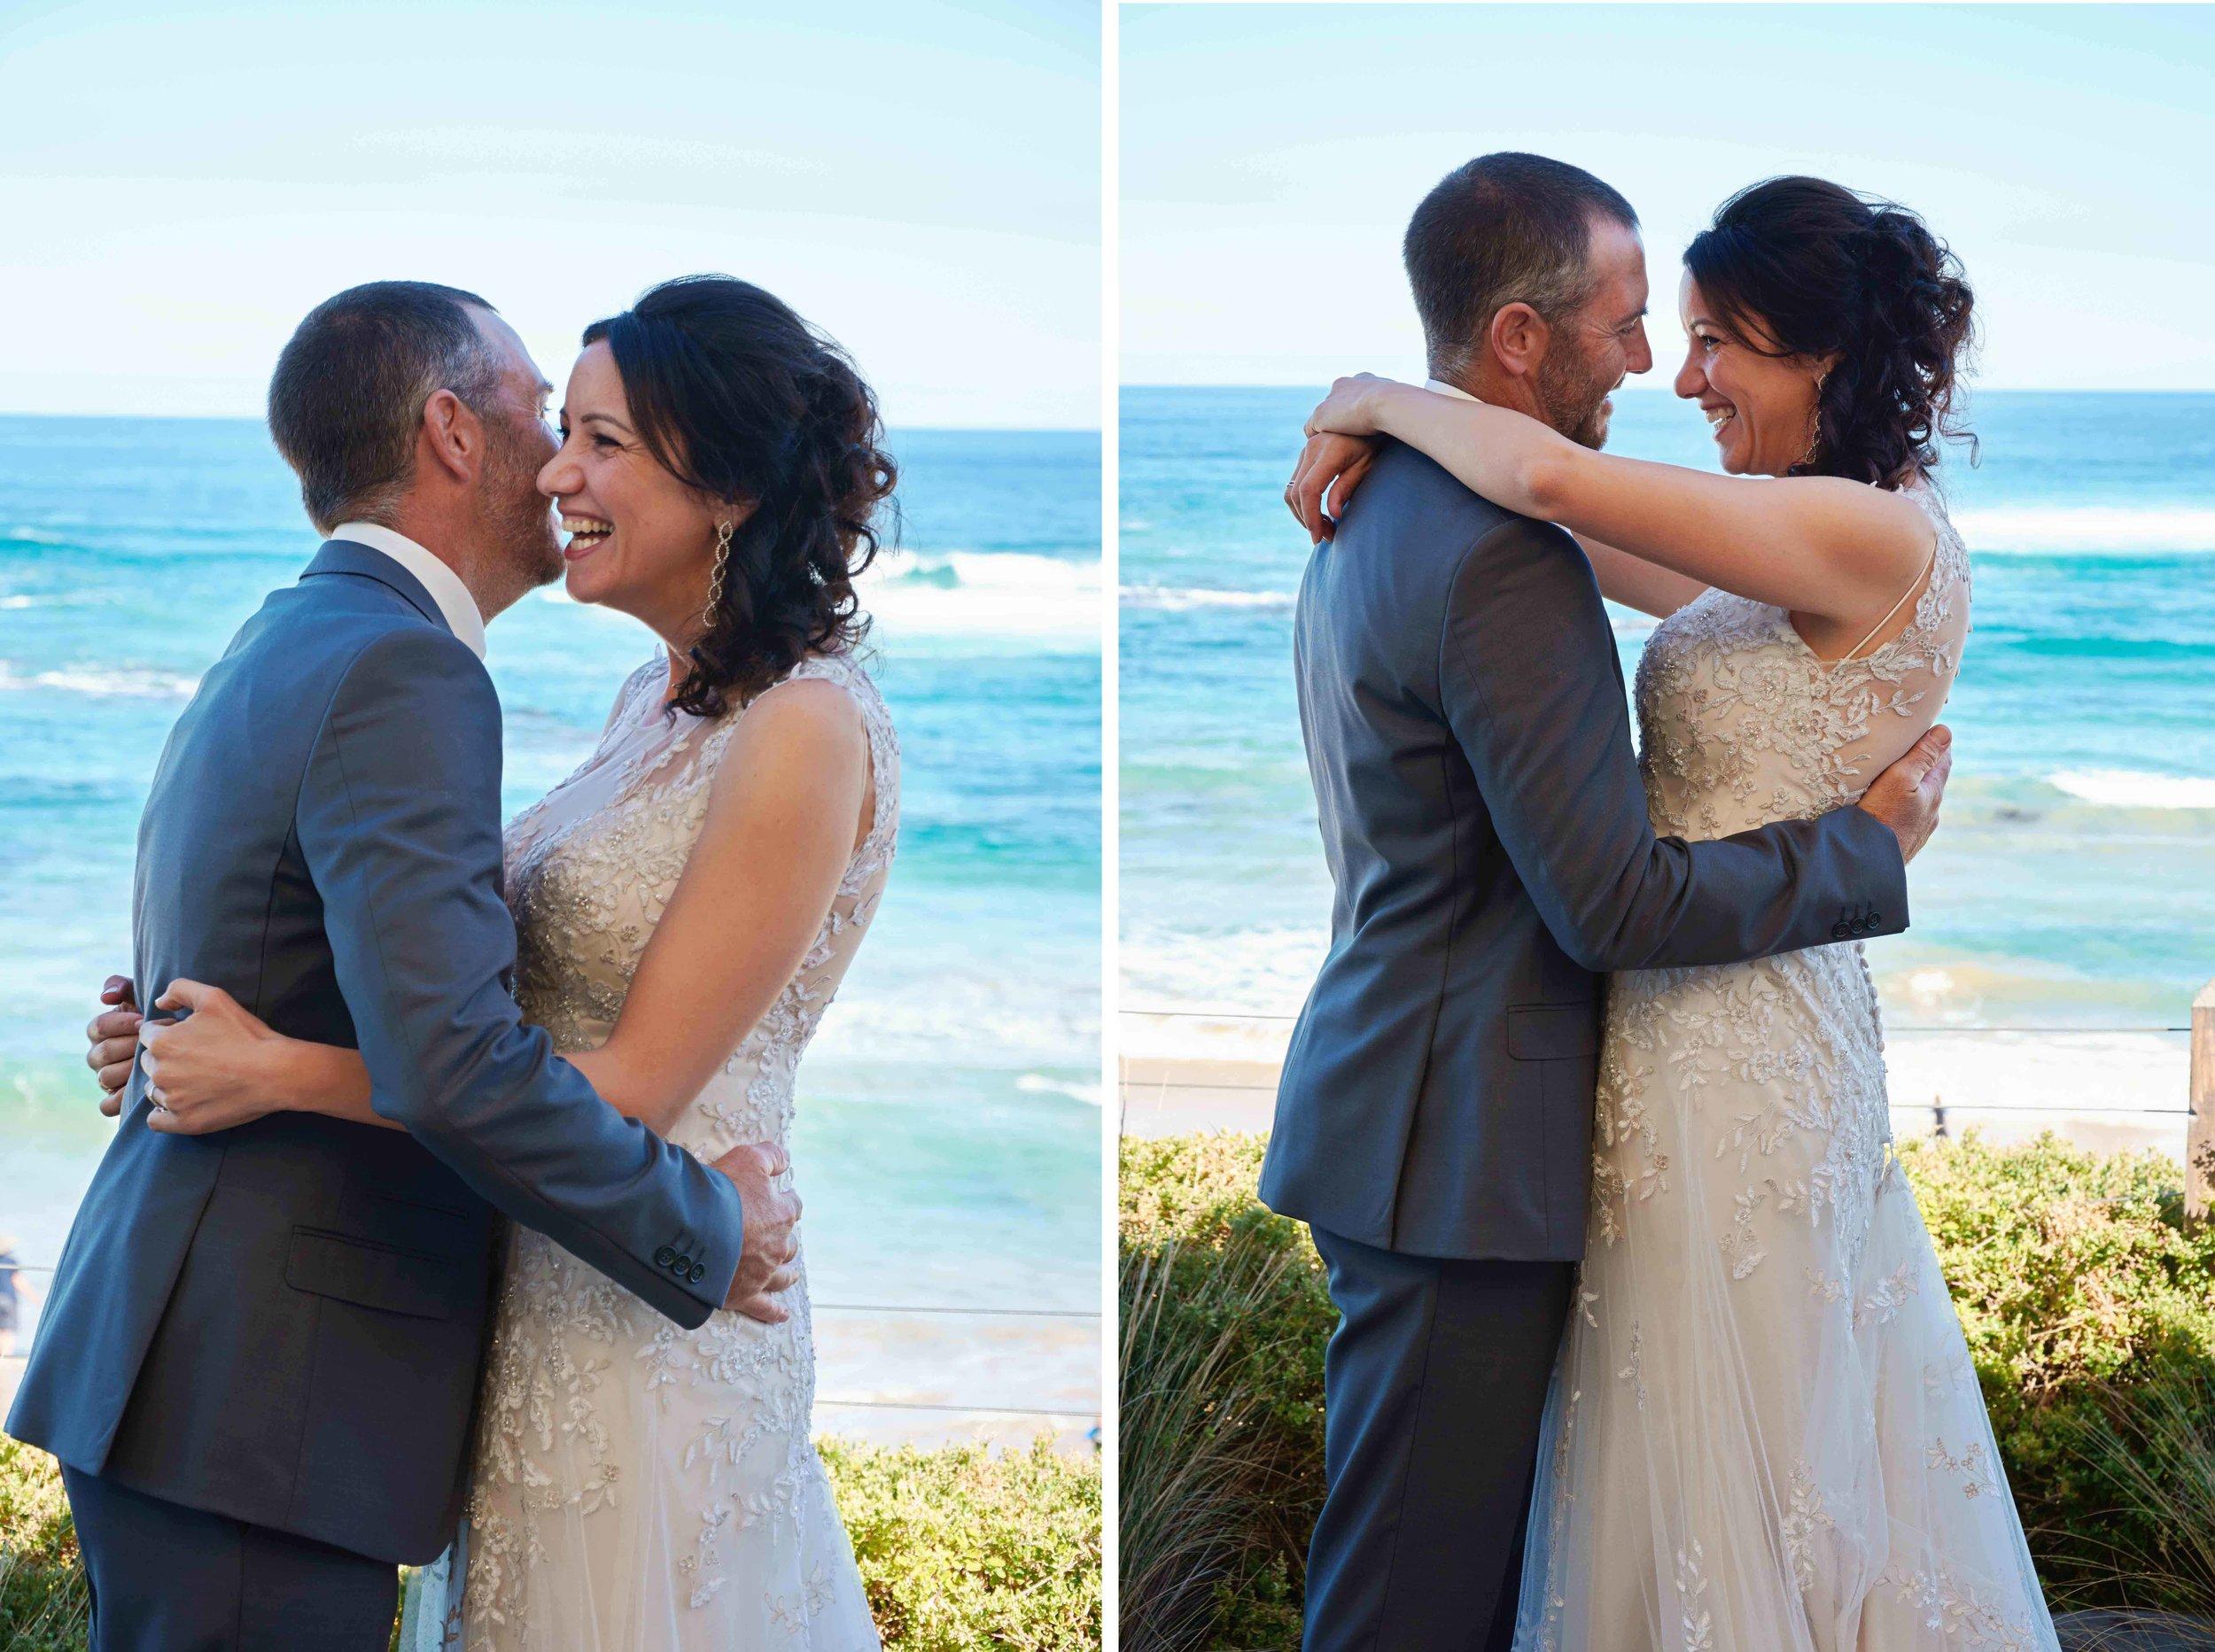 sorrento-wedding-photography-all-smiles-marissa-jade-photography-74.jpg